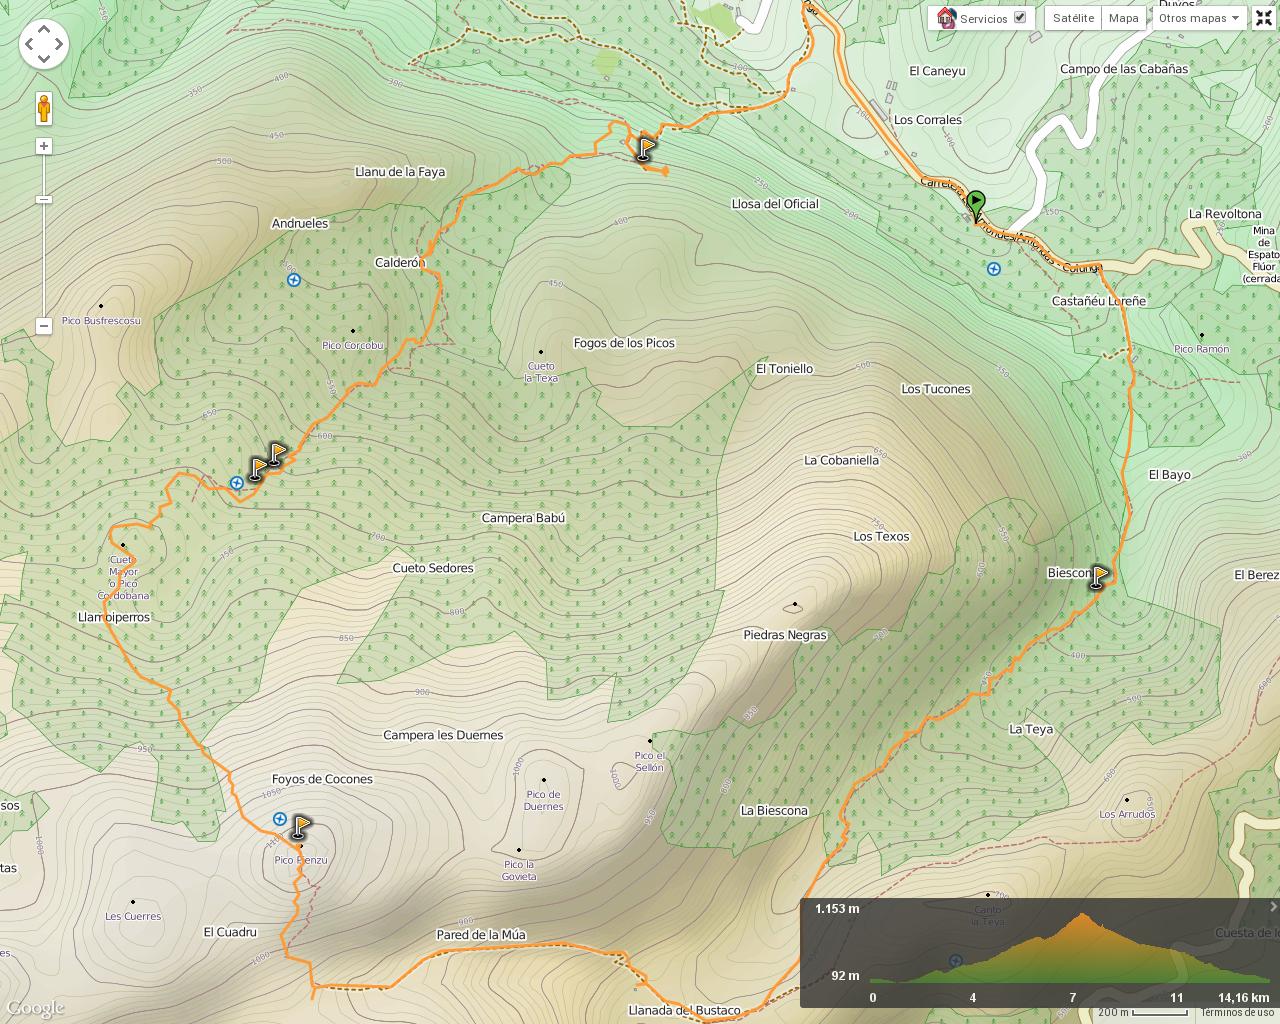 Ruta Pienzu: Mapa de la ruta